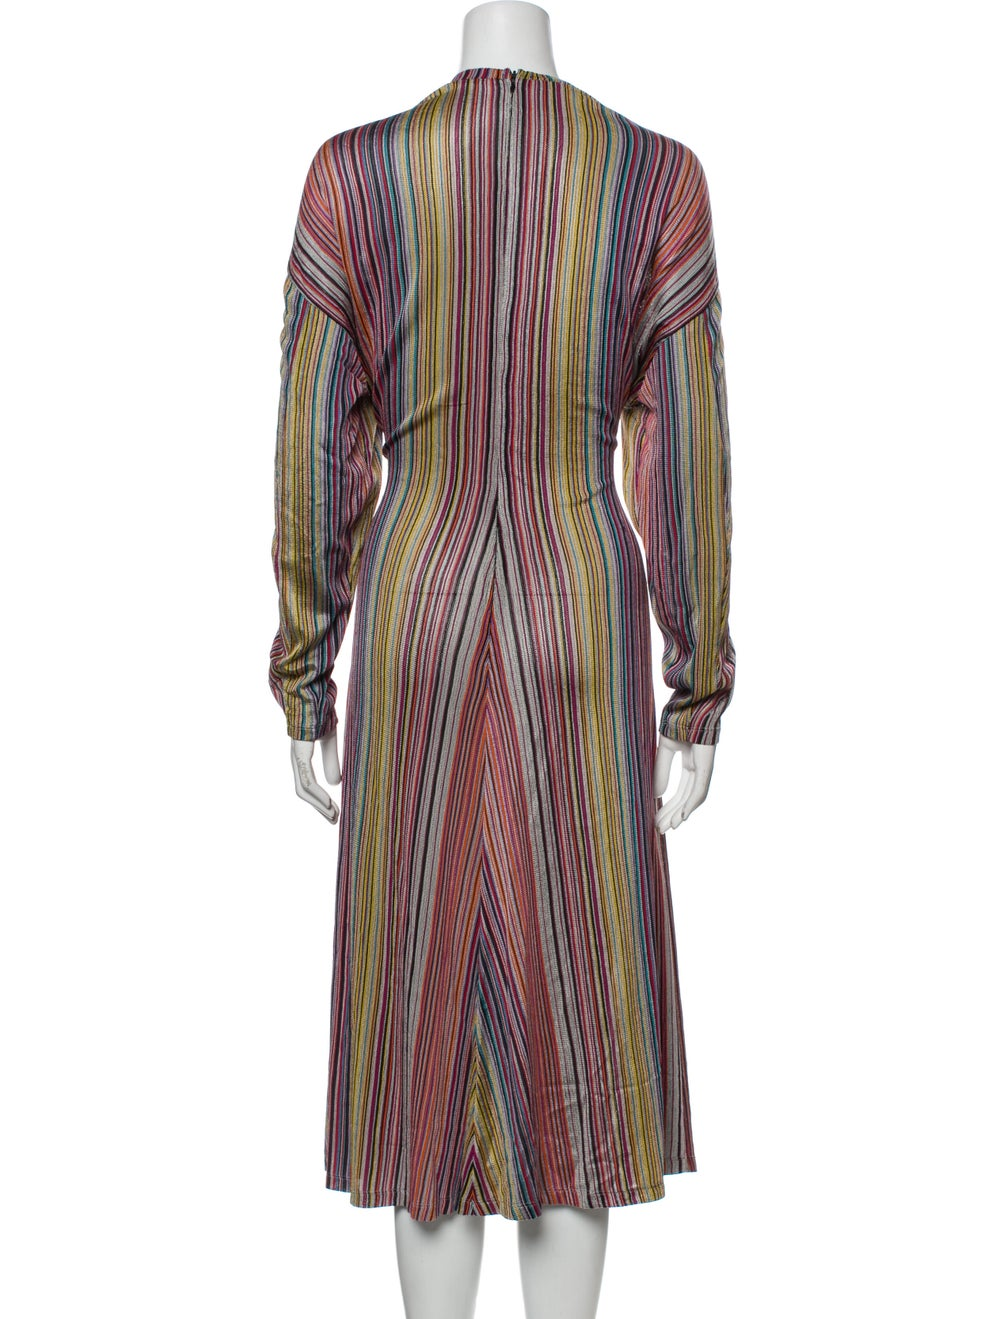 Beaufille Striped Midi Length Dress w/ Tags Orange - image 3